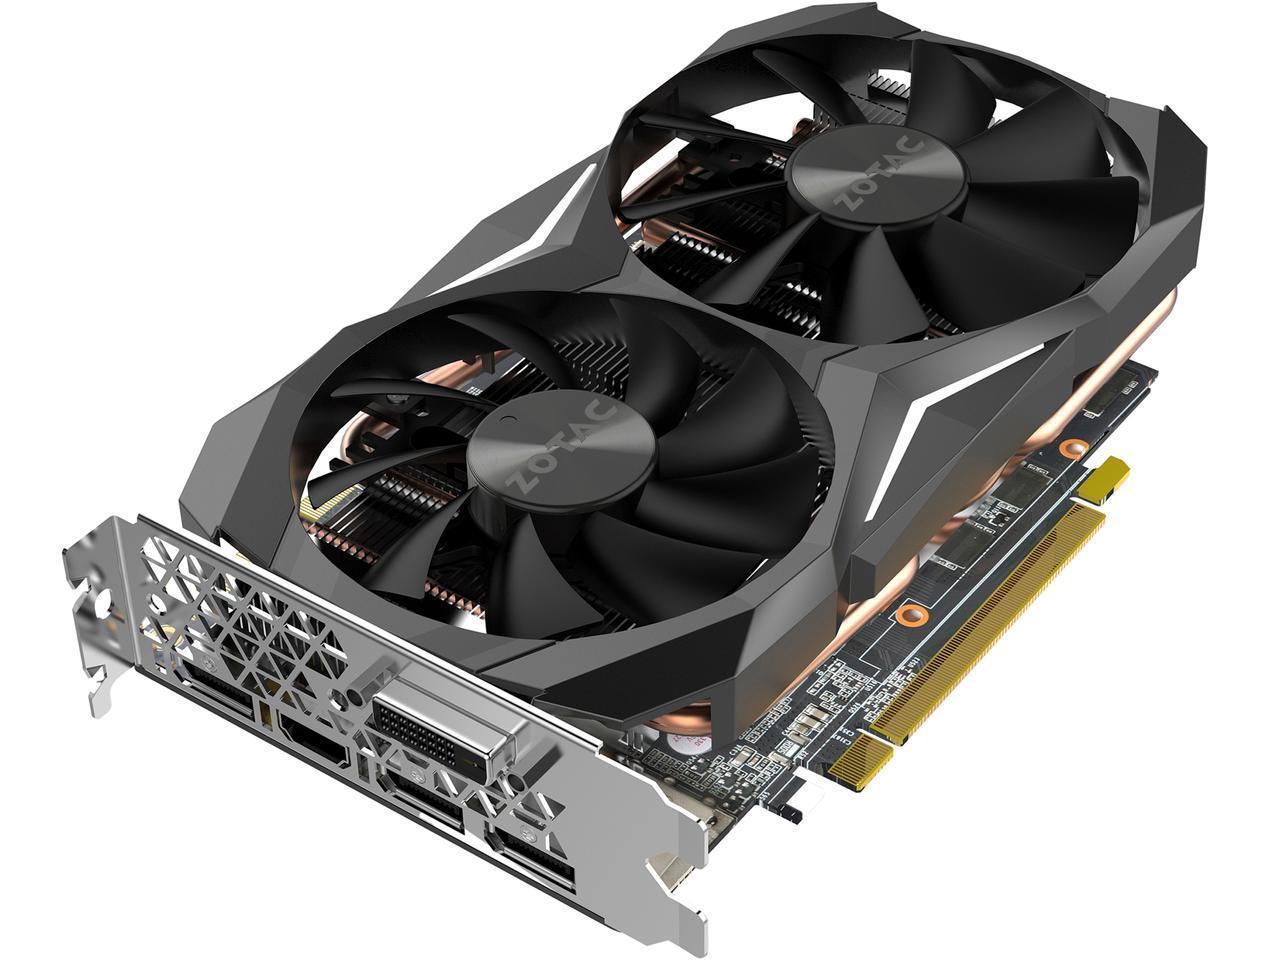 ZOTAC GeForce GTX 1080 Mini, ZT-P10800H-10P, 8GB GDDR5X - $499.99 AC and AR